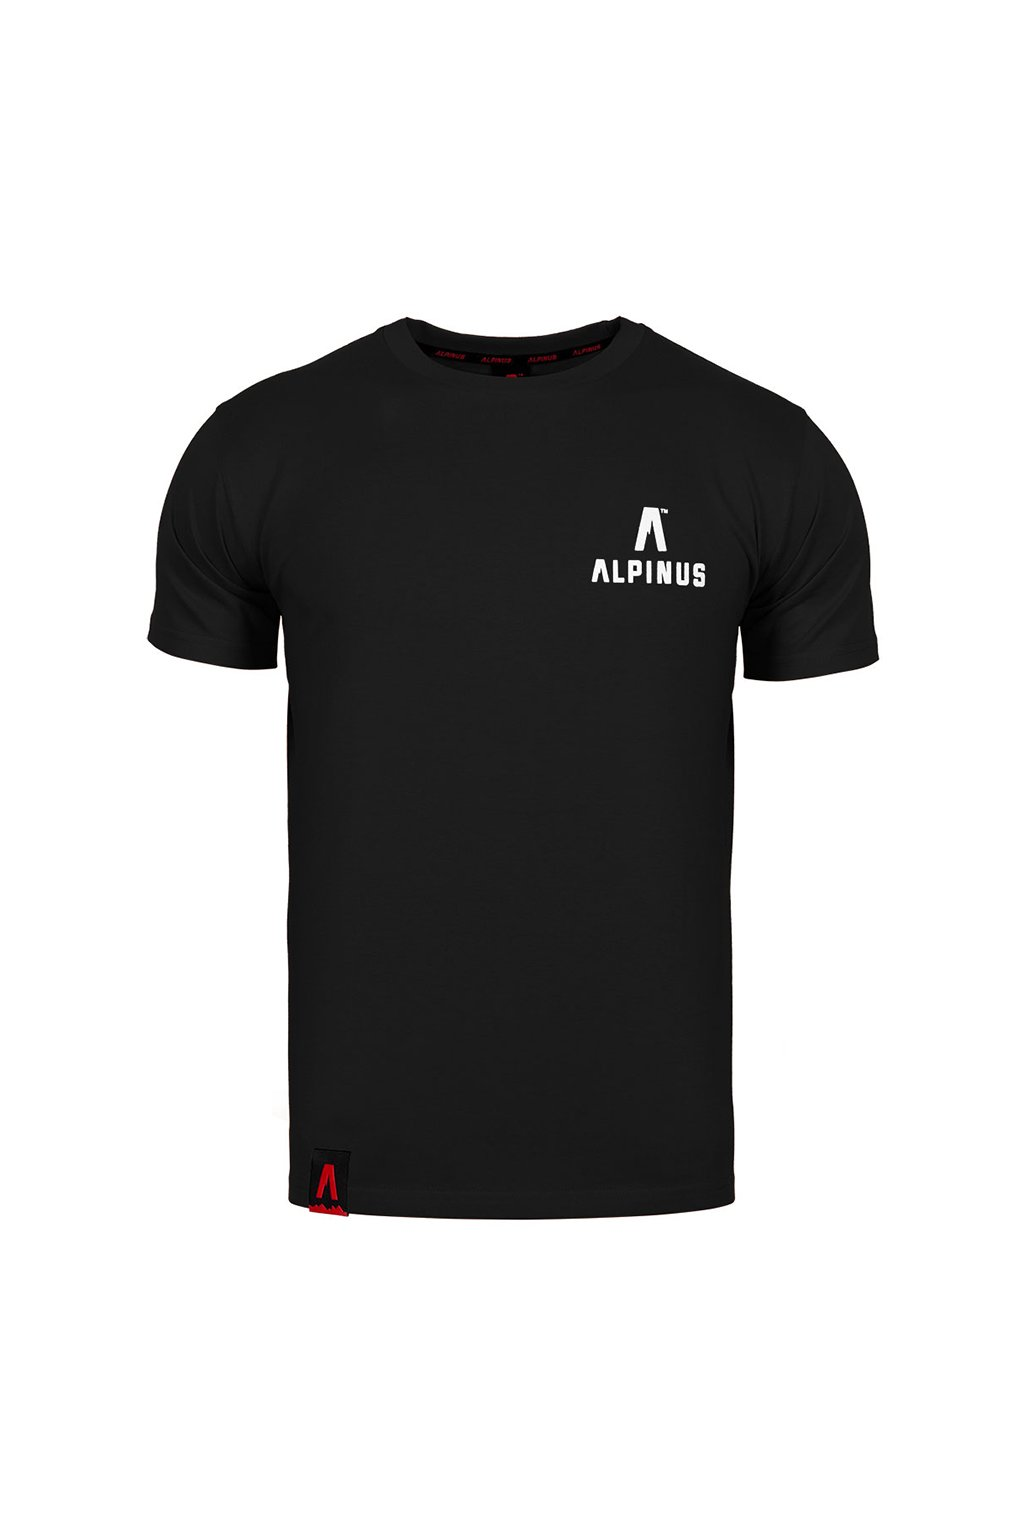 Pánske tričko Alpinus Wycheproof čierne ALP20TC0045